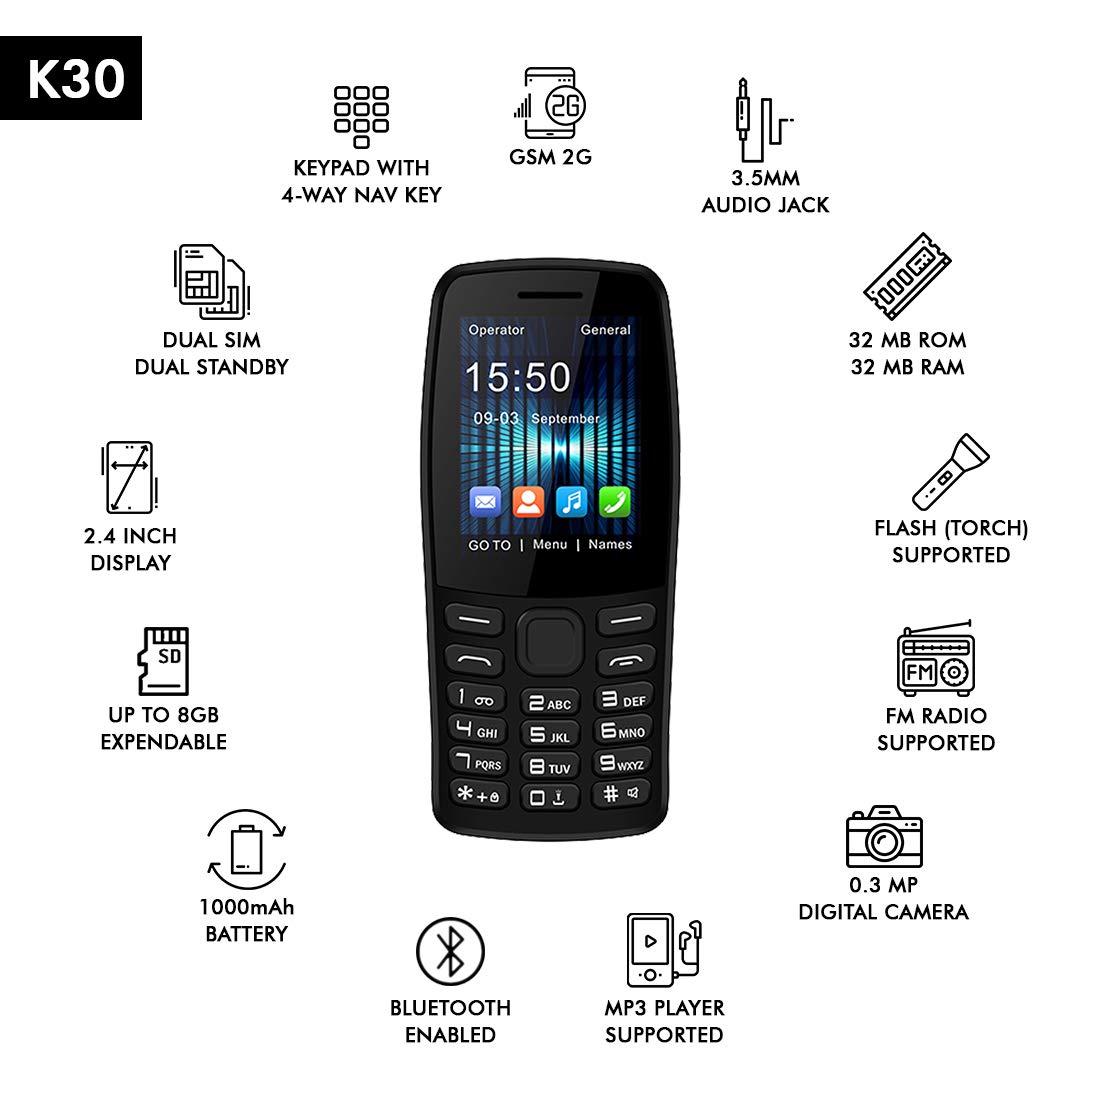 IKall K30 Multimedia Mobile (2.4 Inch Display, Dual Sim, 0.3MP Camera, MP3, Call Recording) (Black)